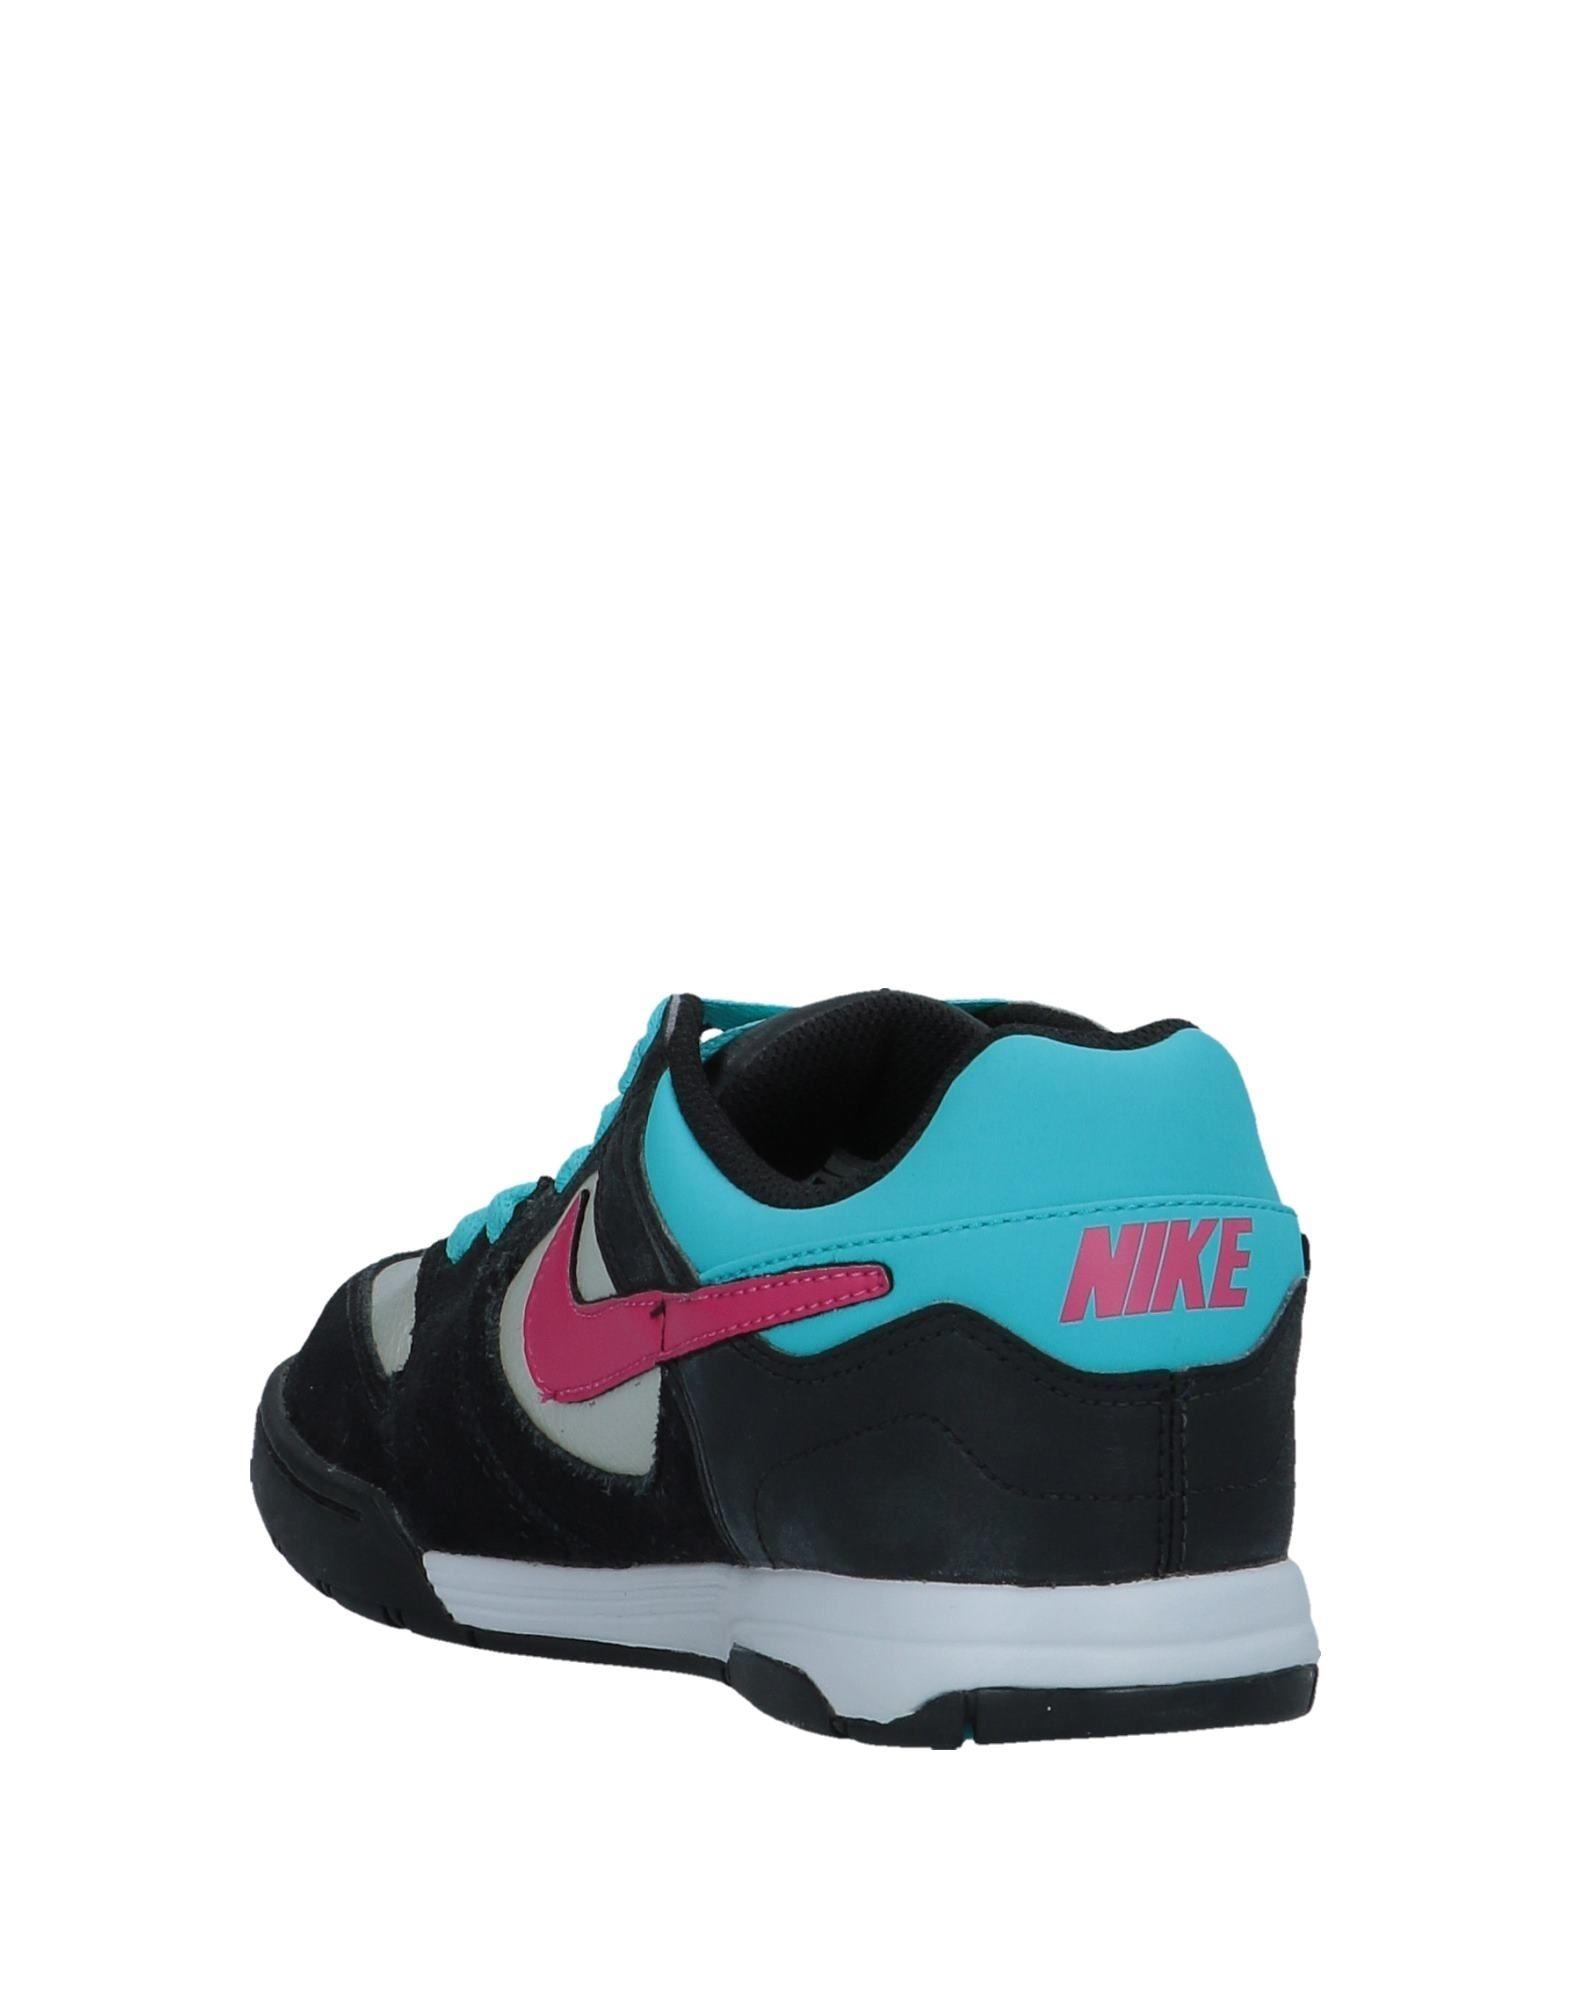 Nike Sneakers Damen beliebte  11522617HI Gute Qualität beliebte Damen Schuhe 797499